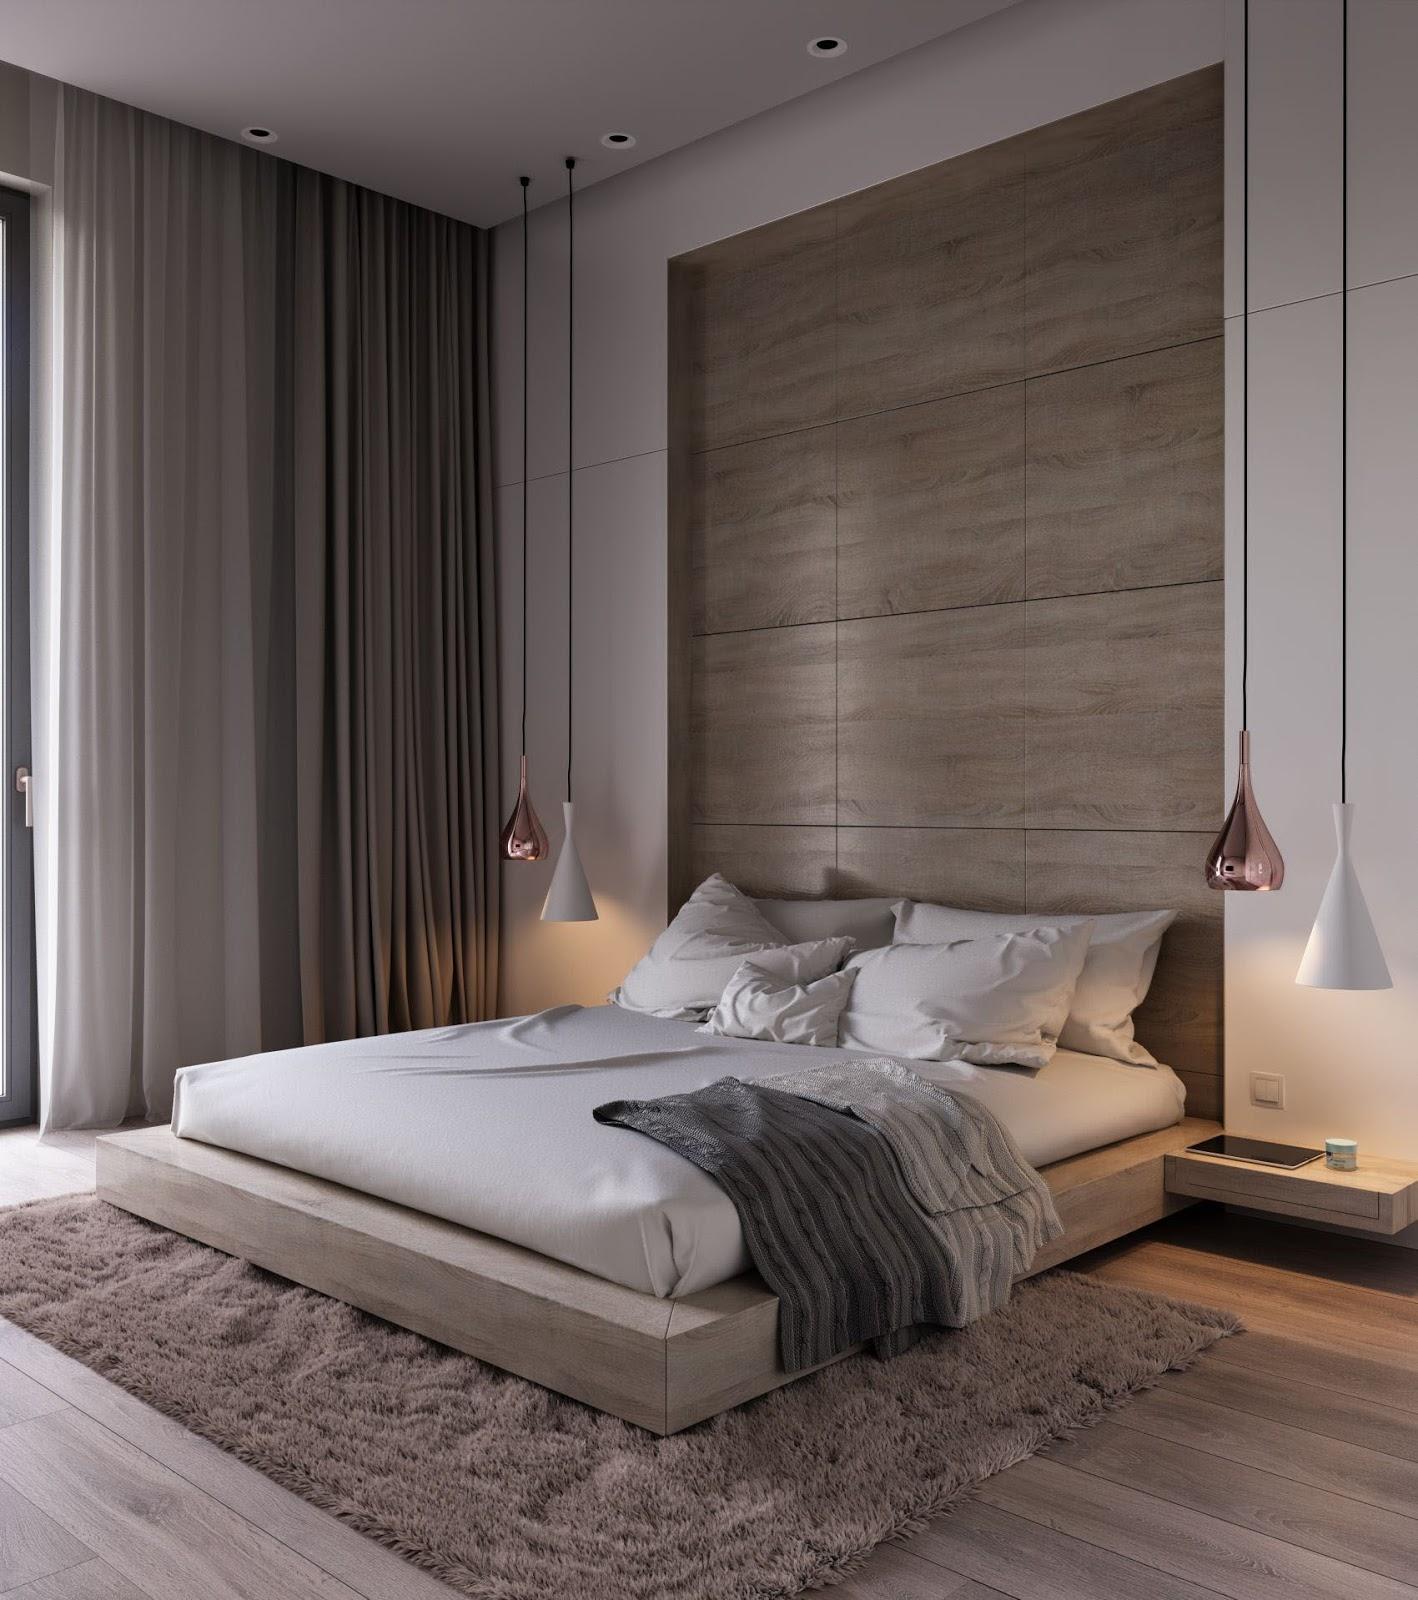 Spectacular Bedroom Carpet Ideas in 2019